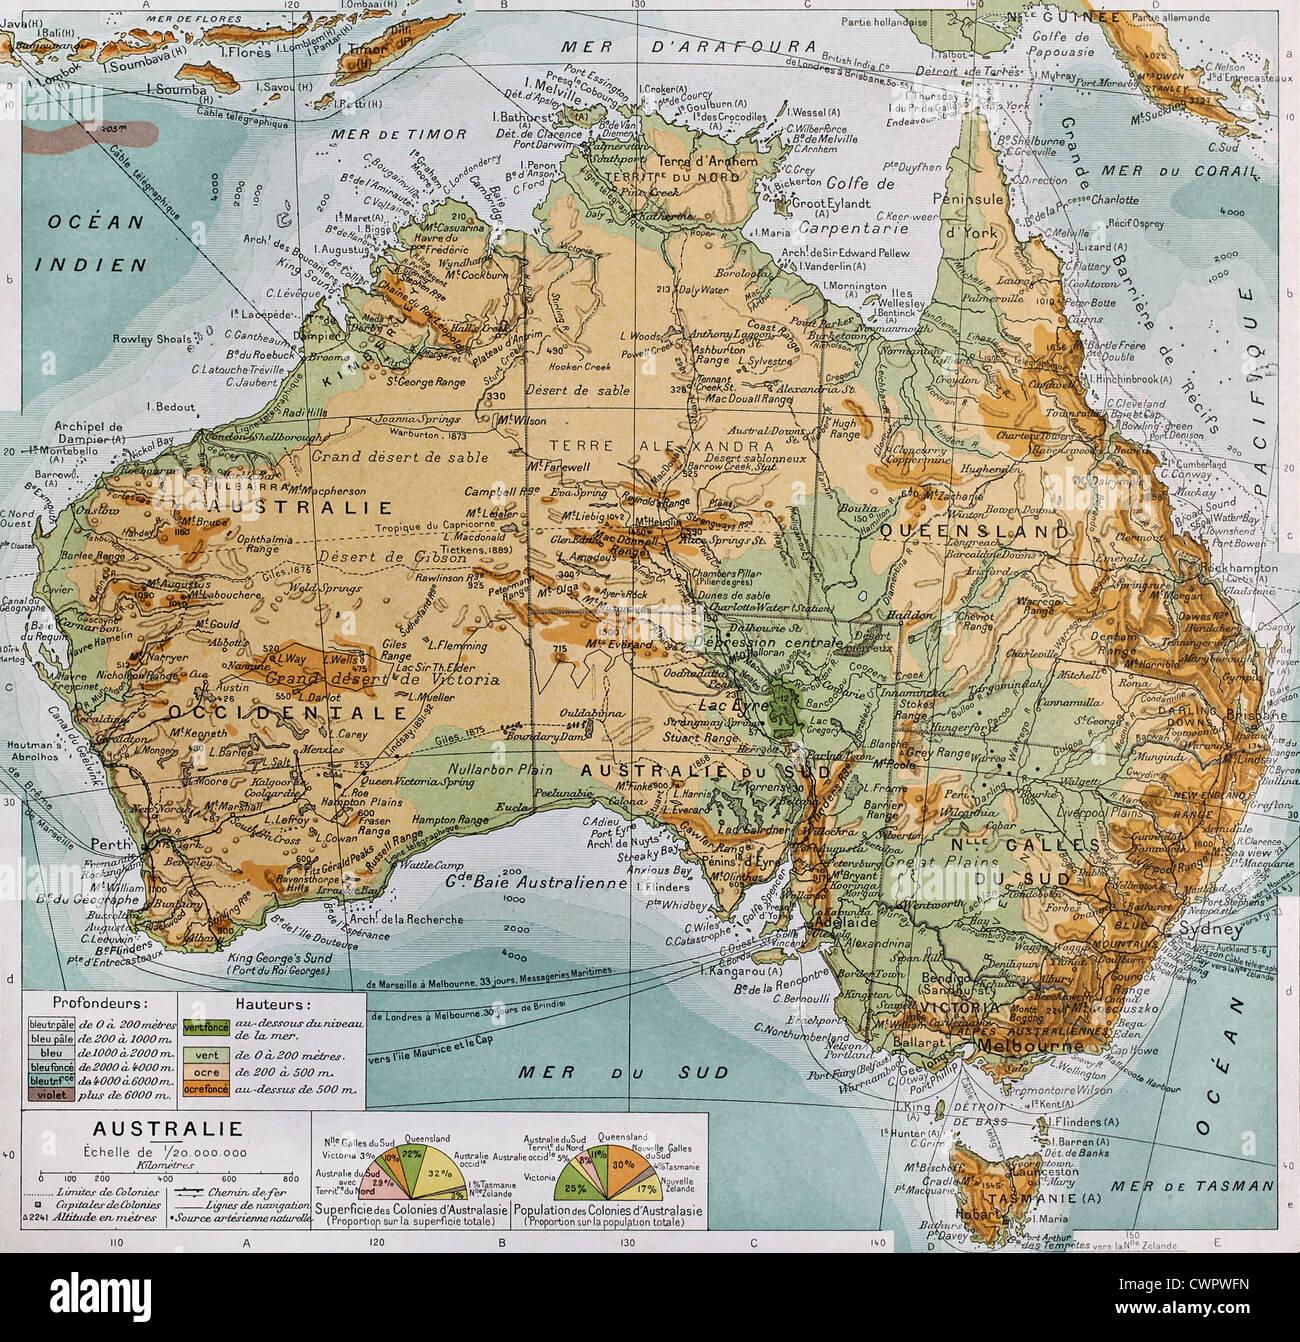 Australia Cartina Geografica.Australia Cartina Fisica Foto Stock Alamy